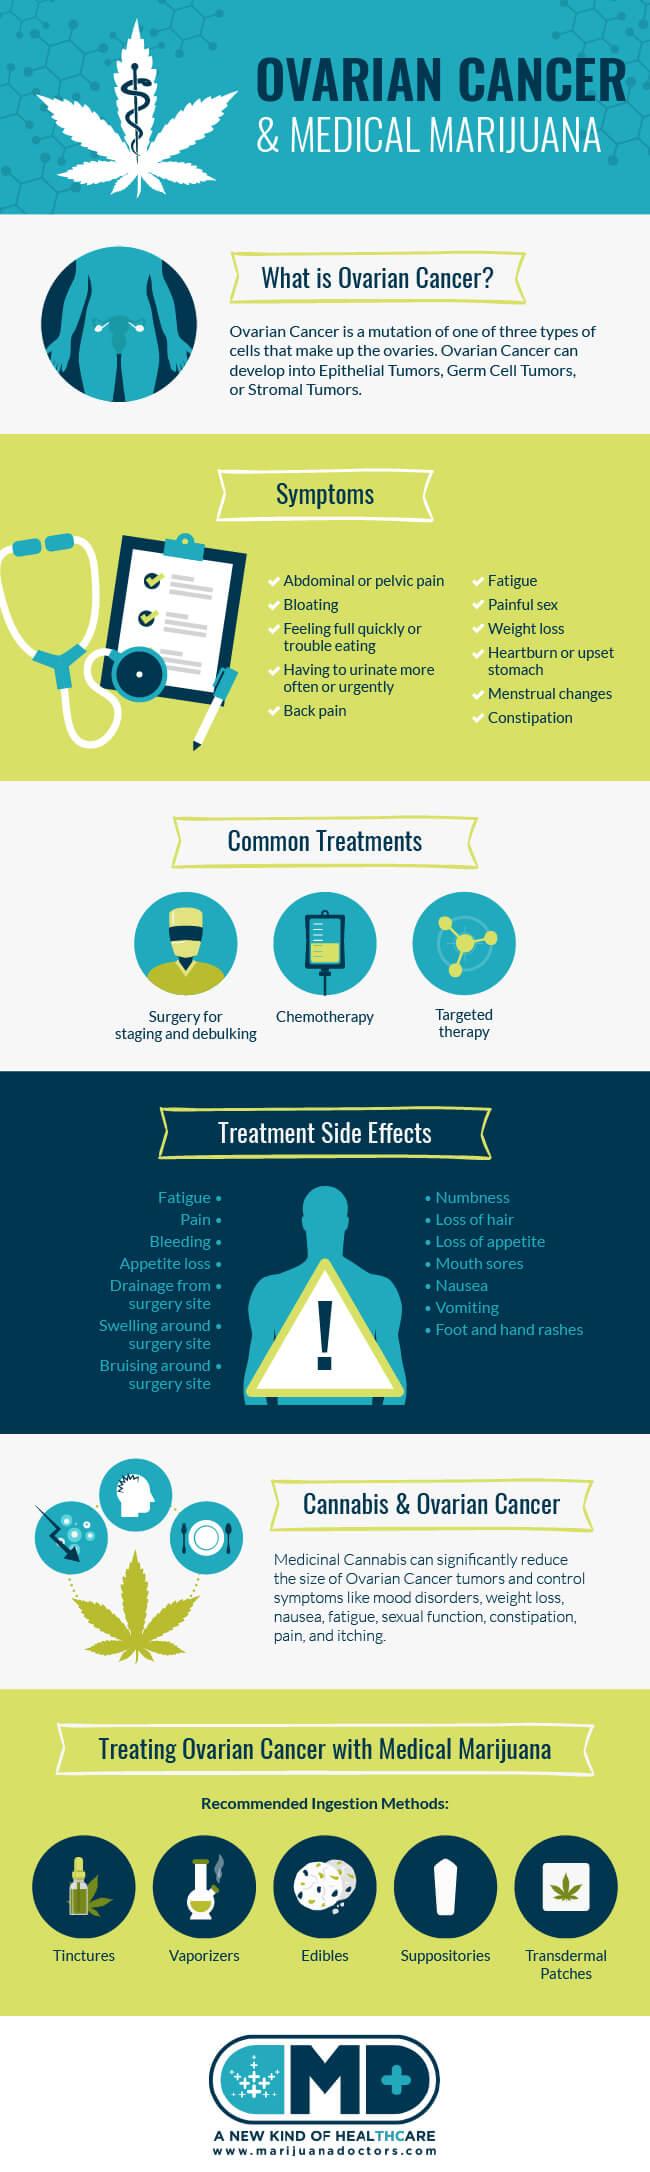 Medical Marijuana and Ovarian Cancer